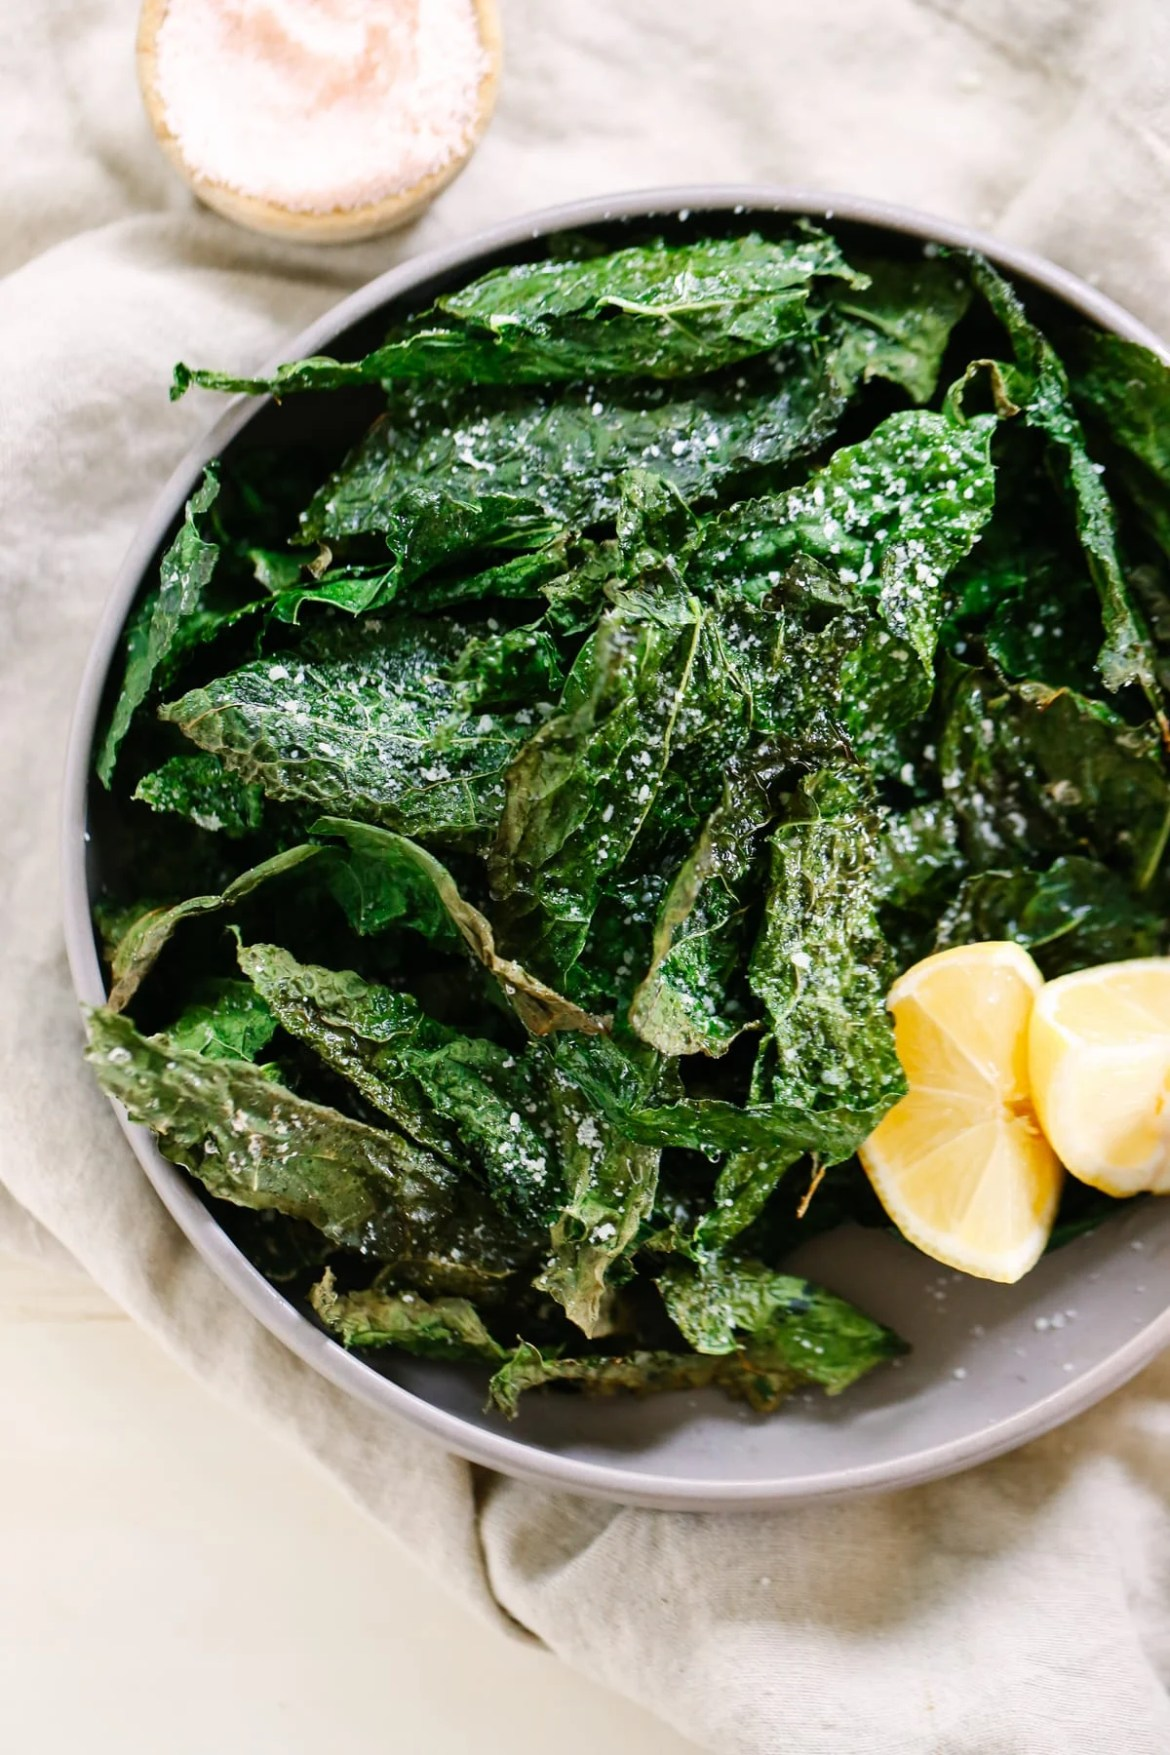 Image result for Homemade kale chips